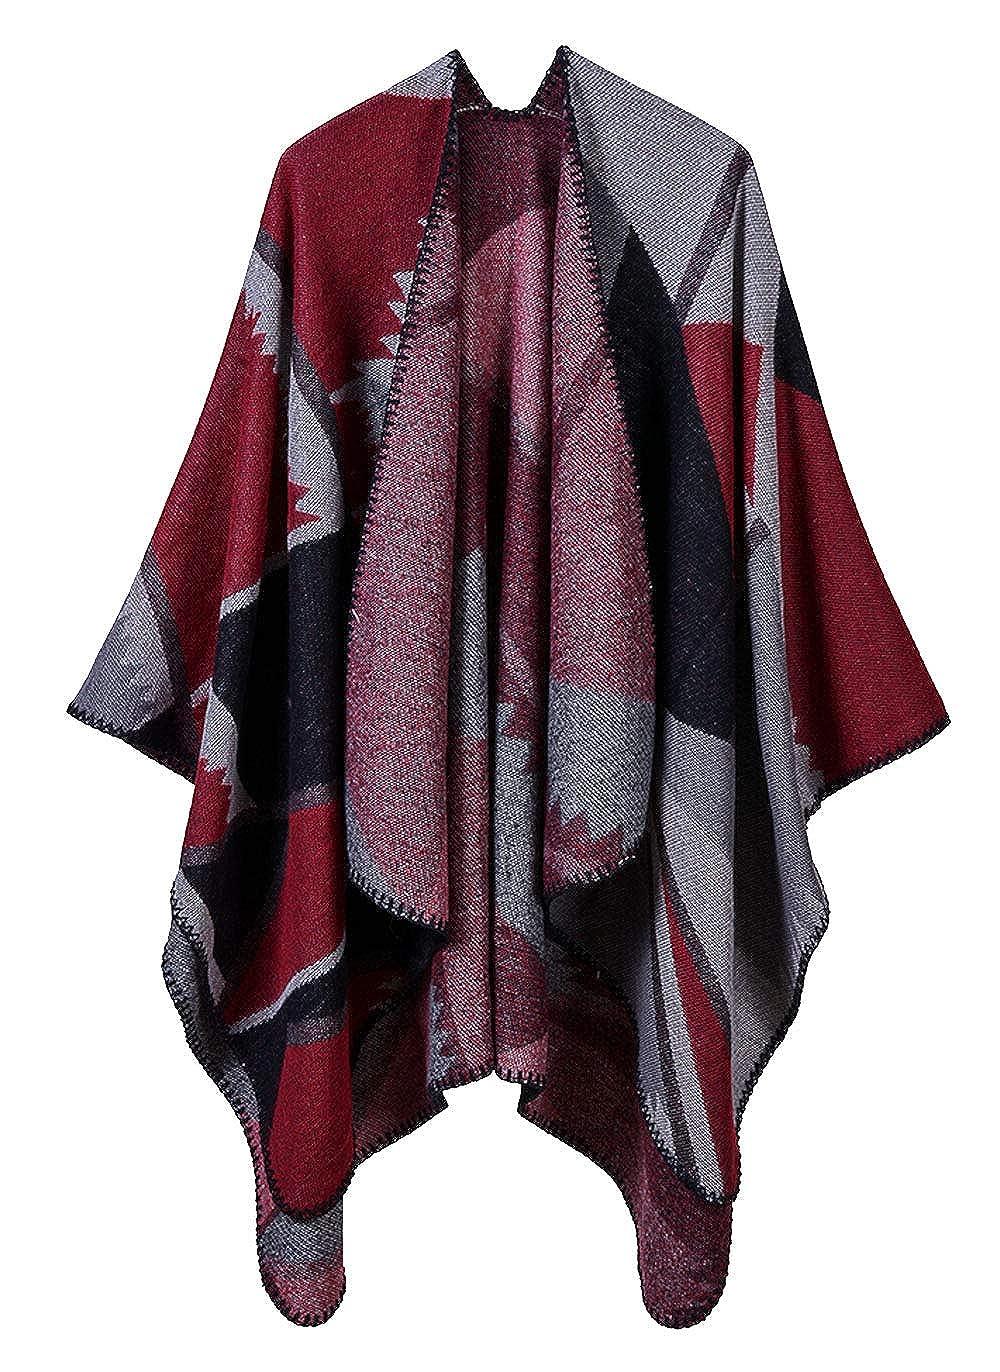 /étnica estampada retro Camisa de lino para hombre de manga corta Relaxed-fit Henley playa NEWISTAR para verano